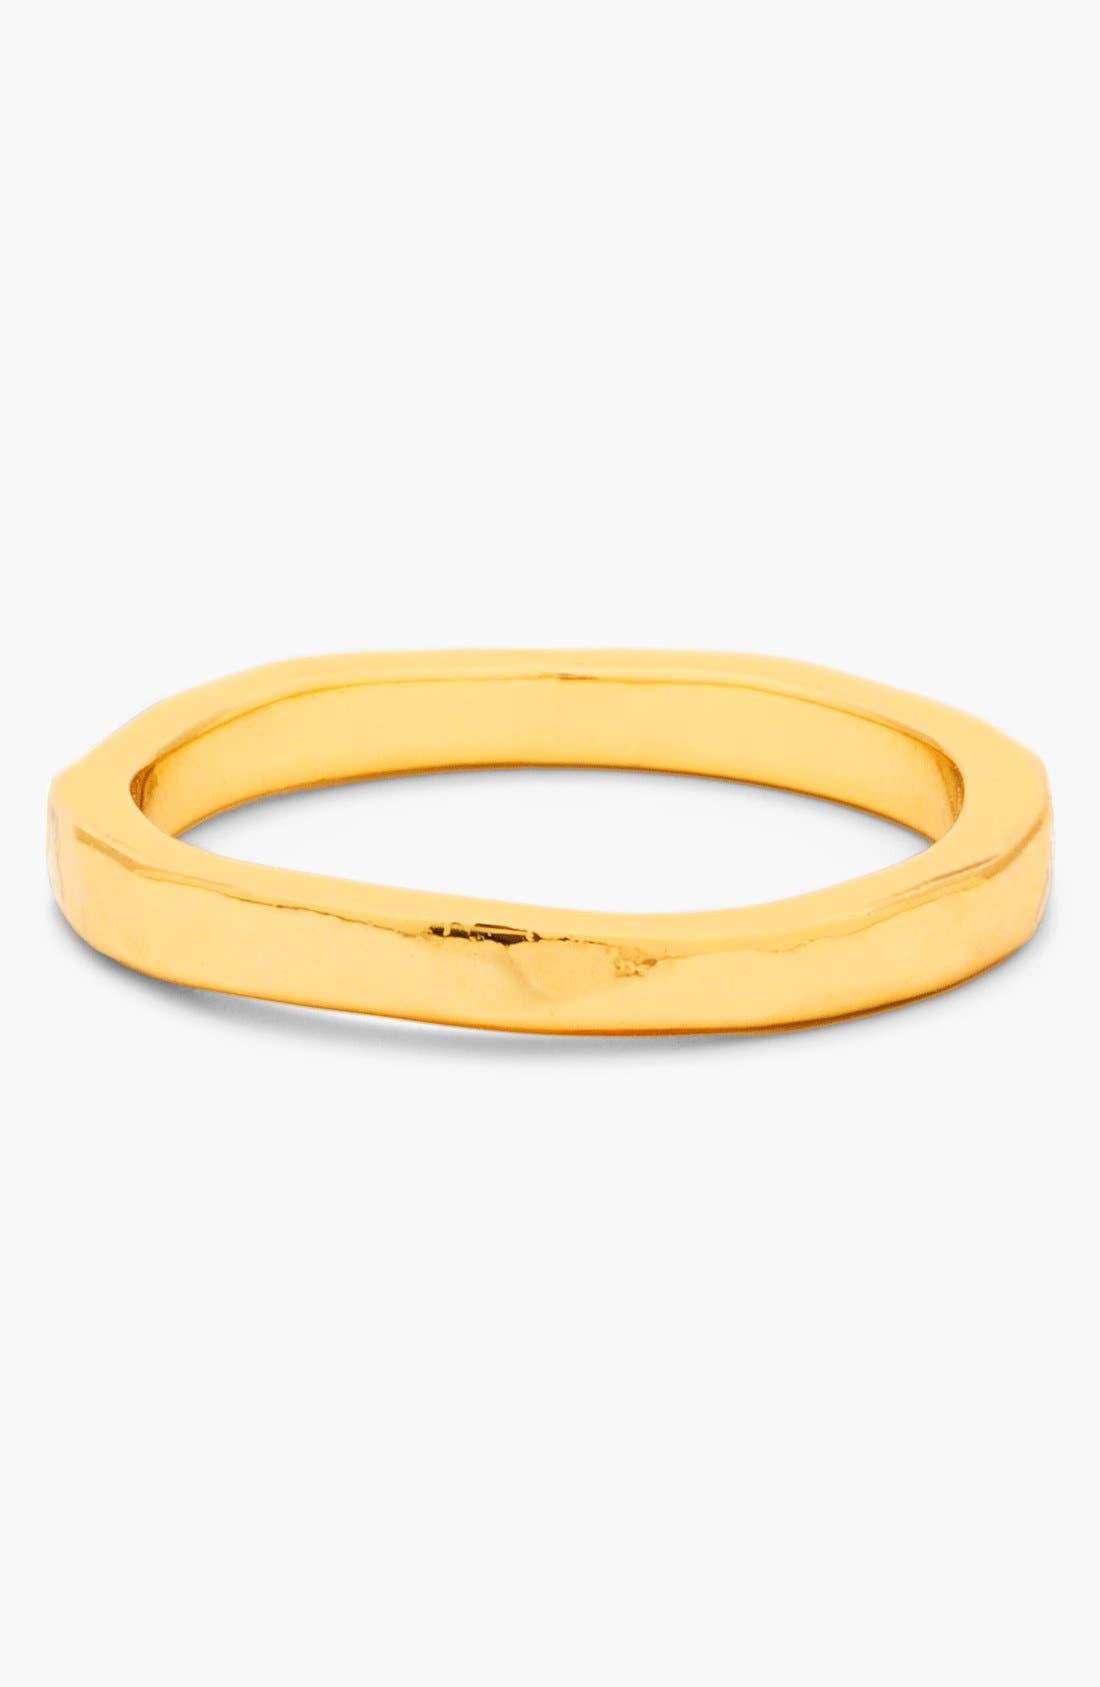 Main Image - gorjana 'Taner' Midi Ring